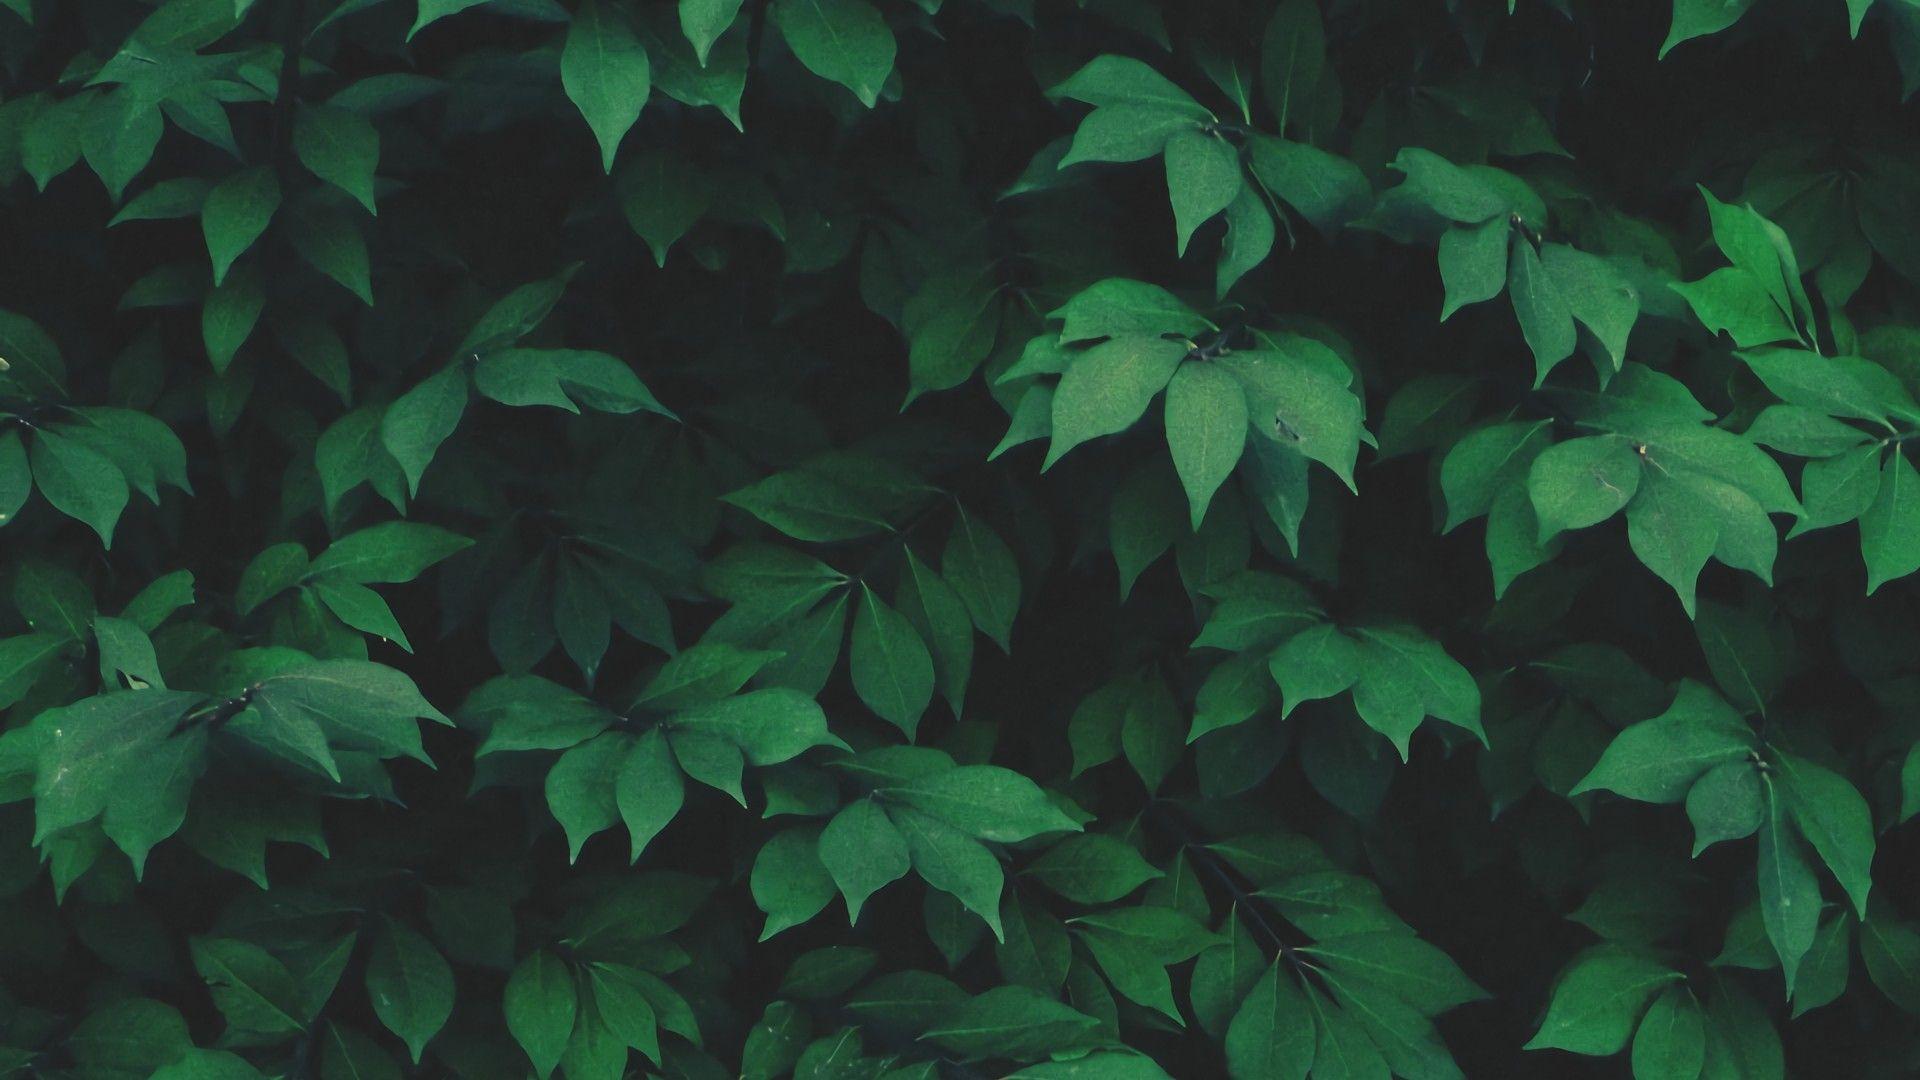 General 1920x1080 Nature Solo Plants Leaves Green Aesthetic Desktop Wallpaper Plant Leaves Green Leaves